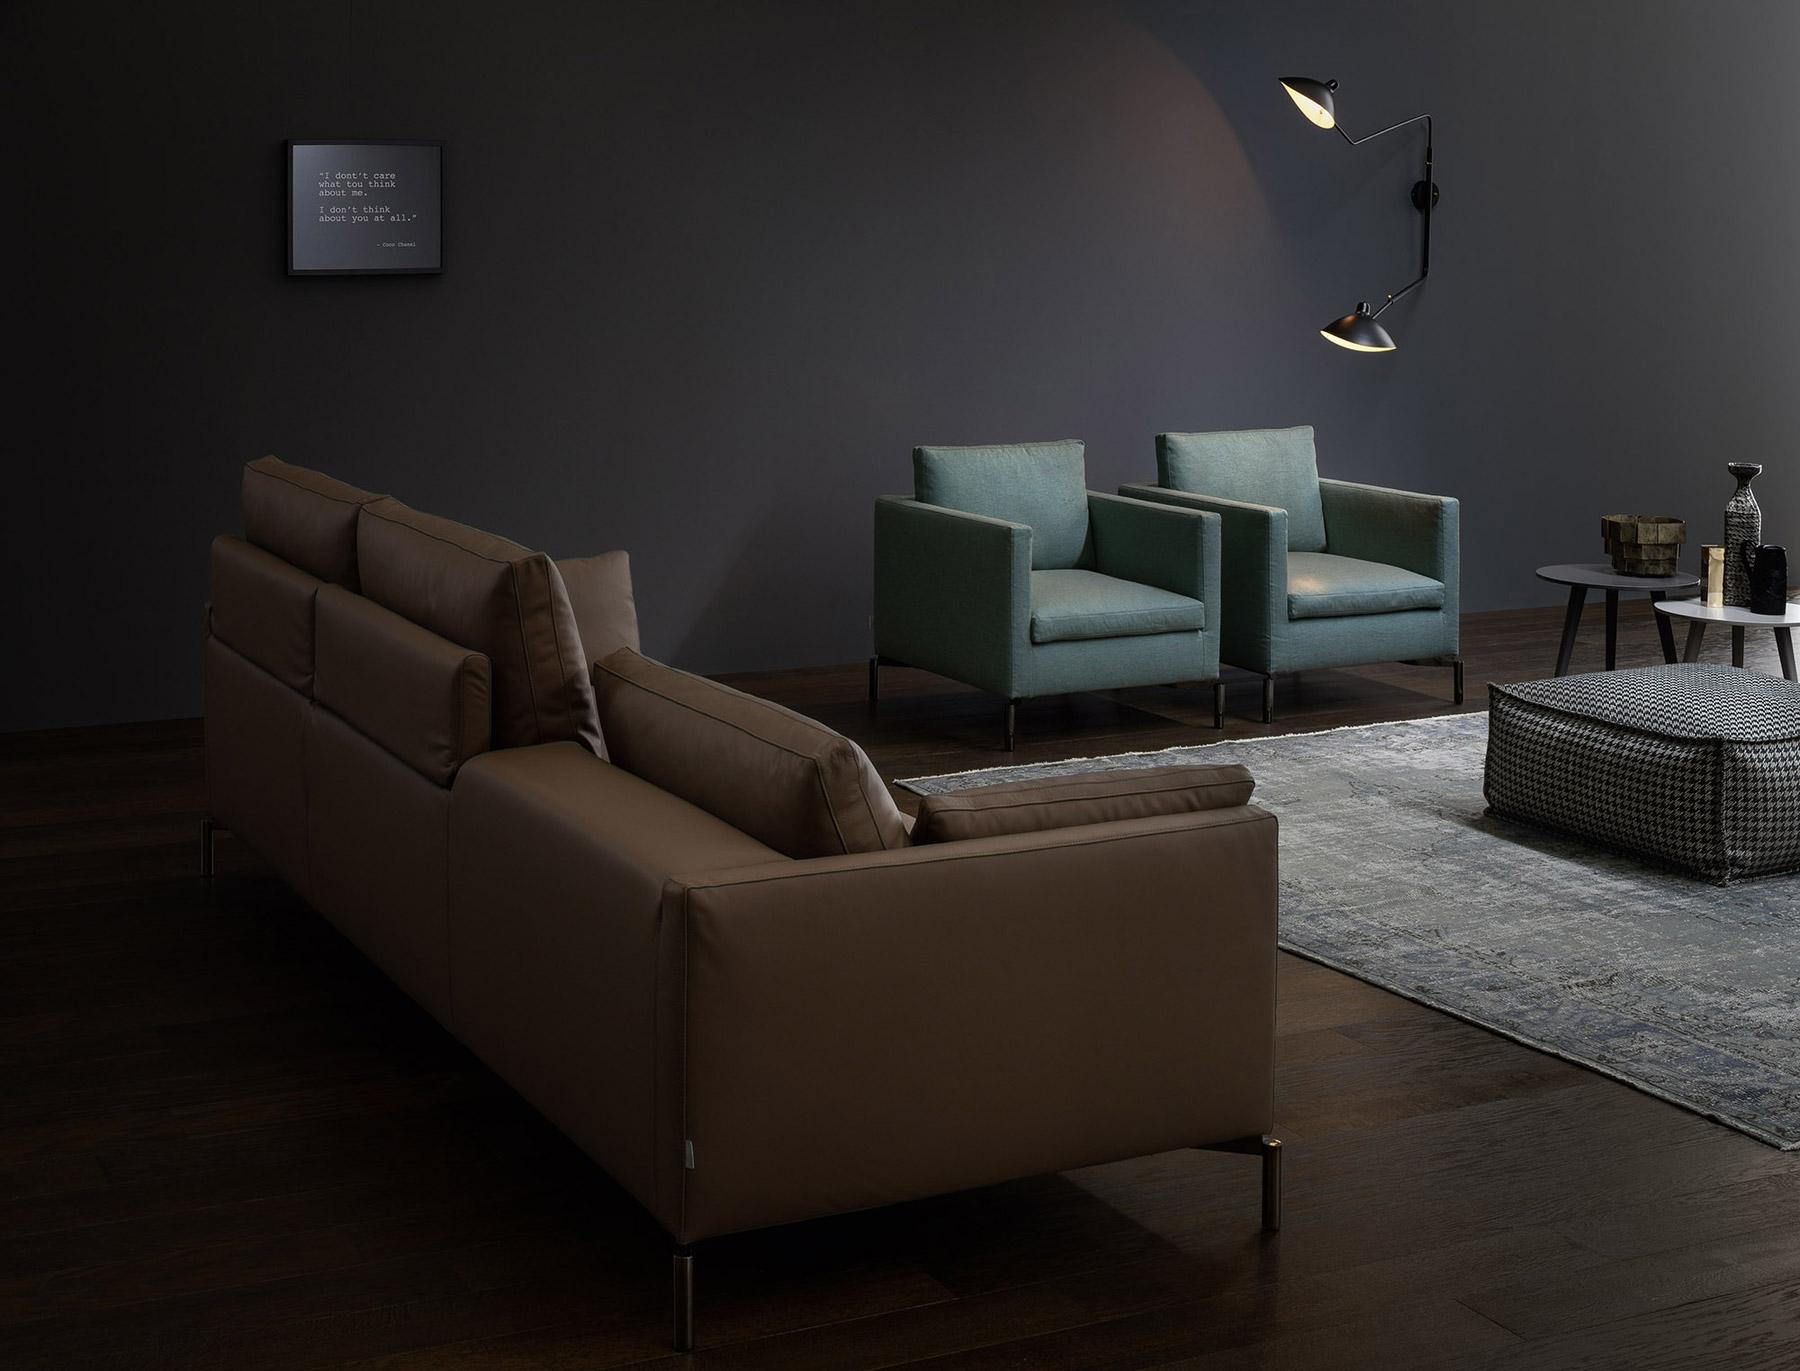 Salotto Moderno Verde : Salotto moderno marrone e verde